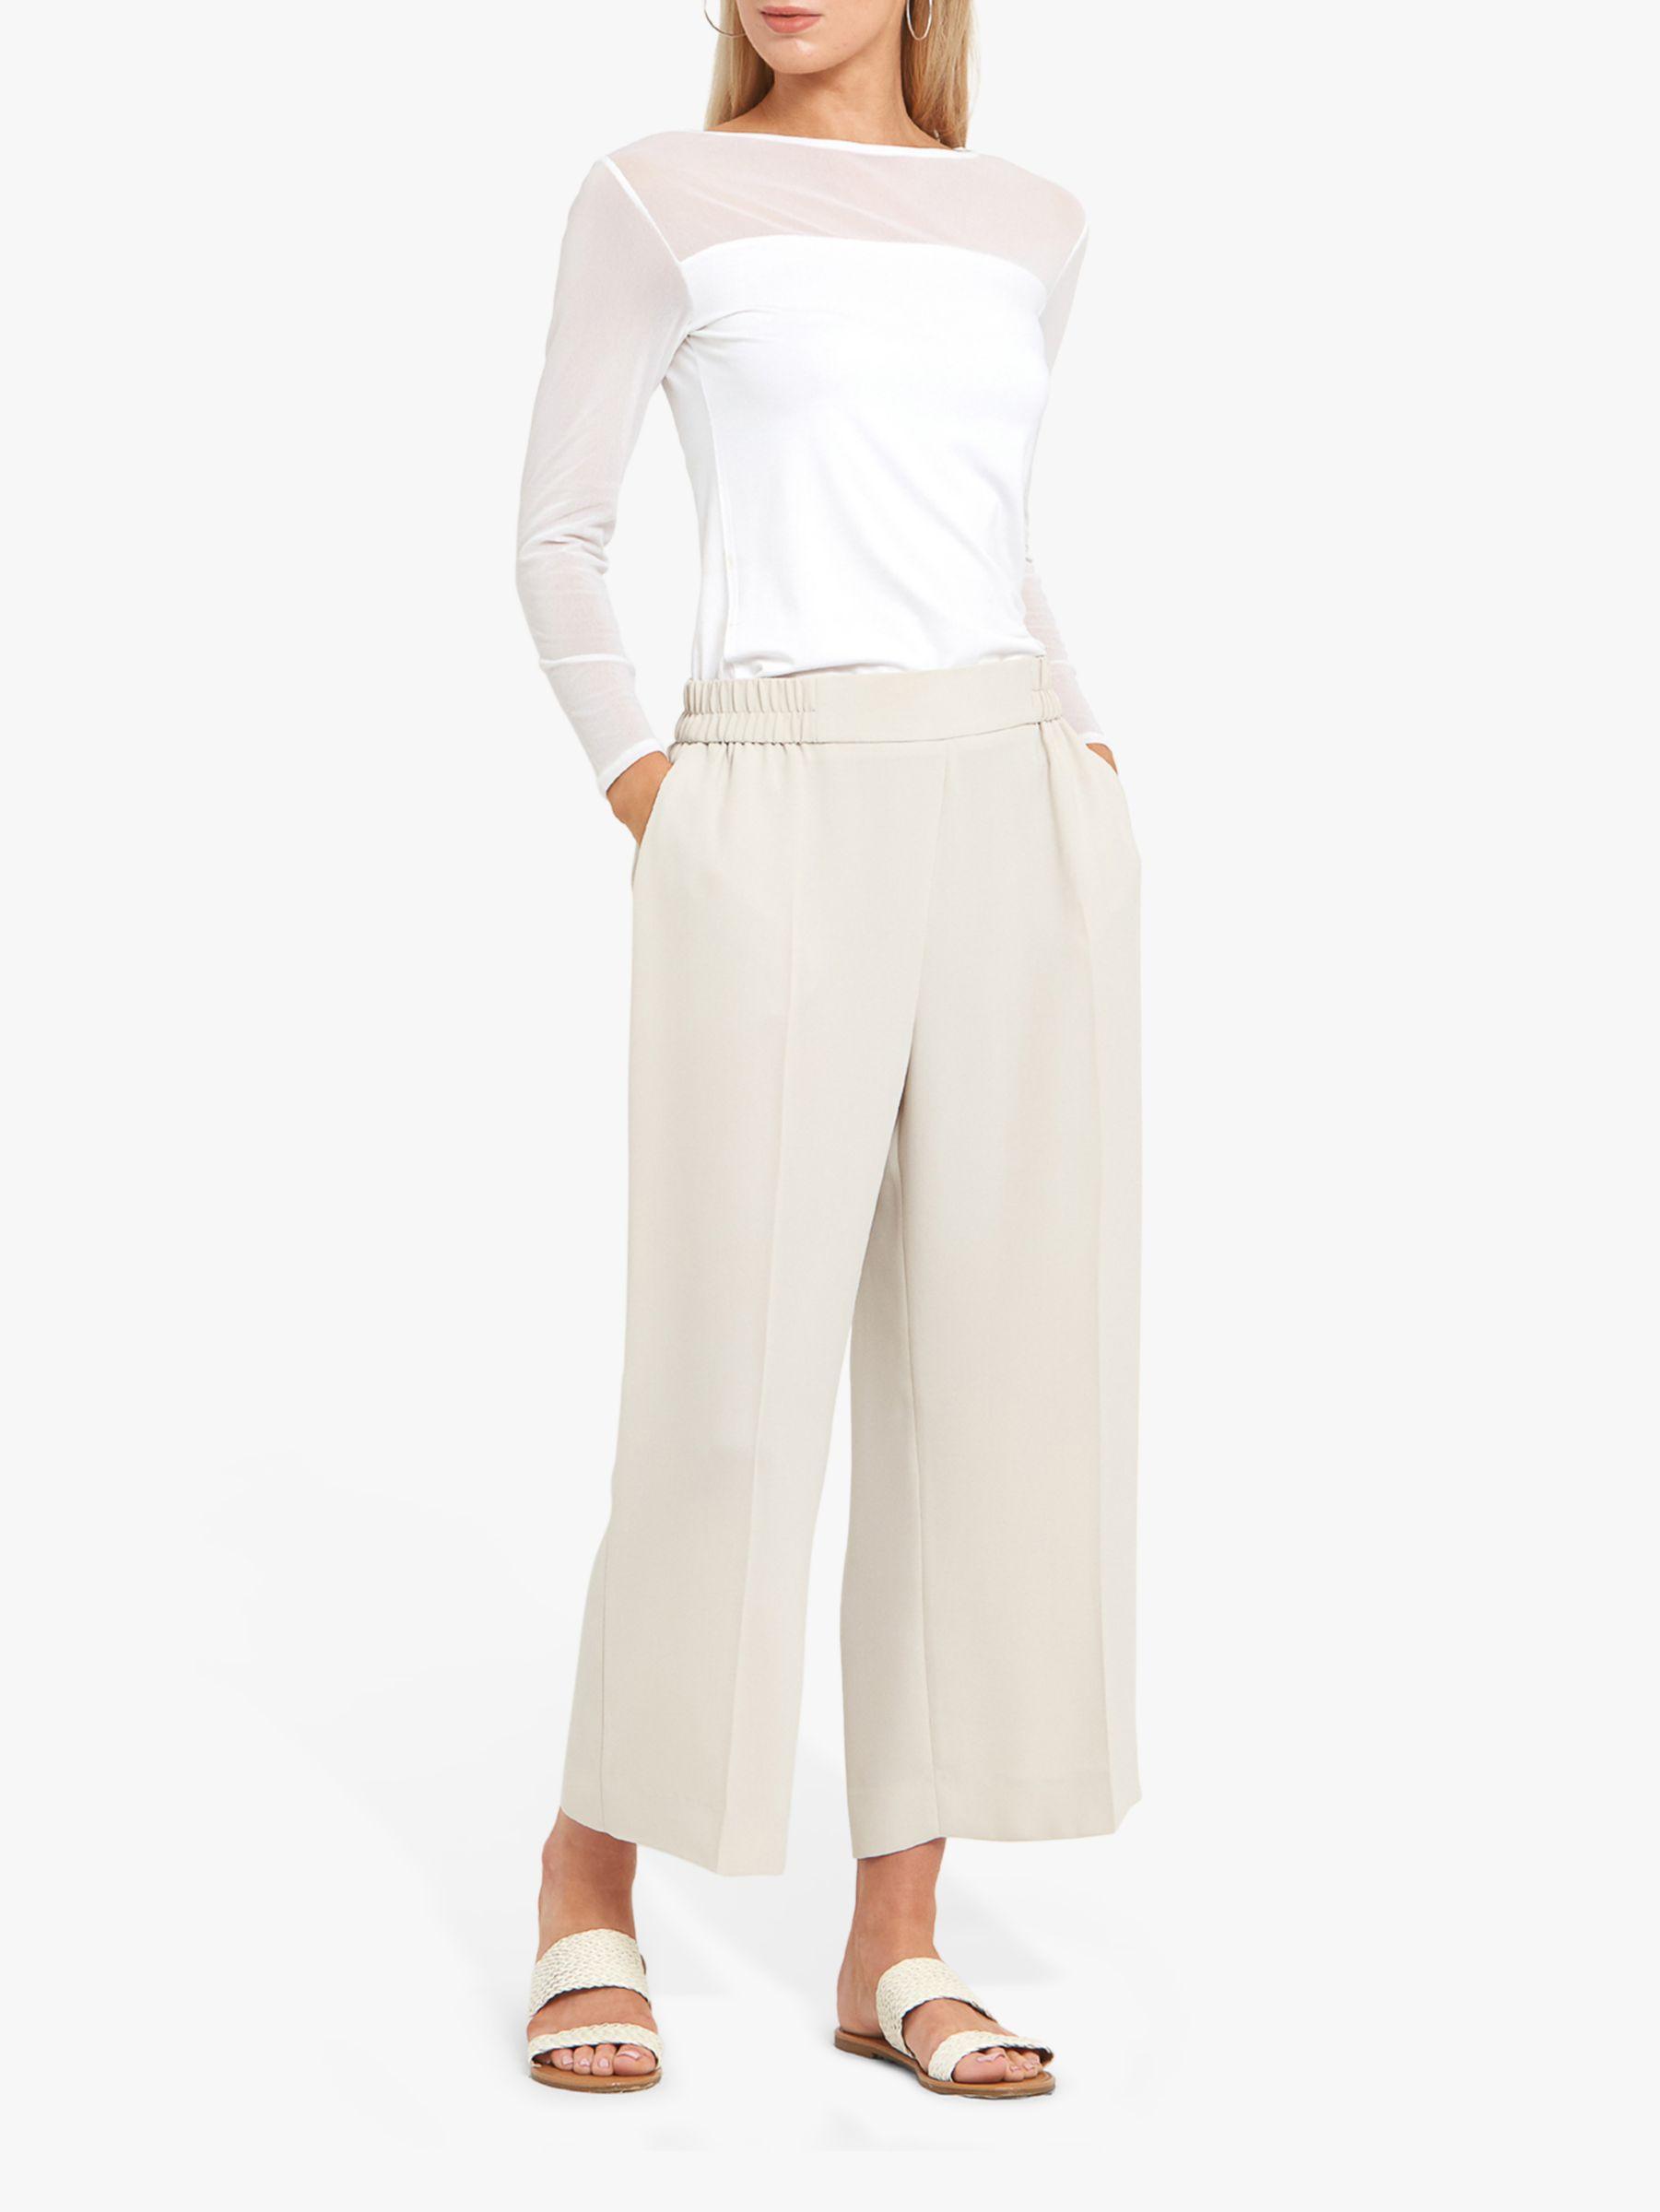 Helen McAlinden Helen McAlinden Aaliyah Long Sleeved Top, White